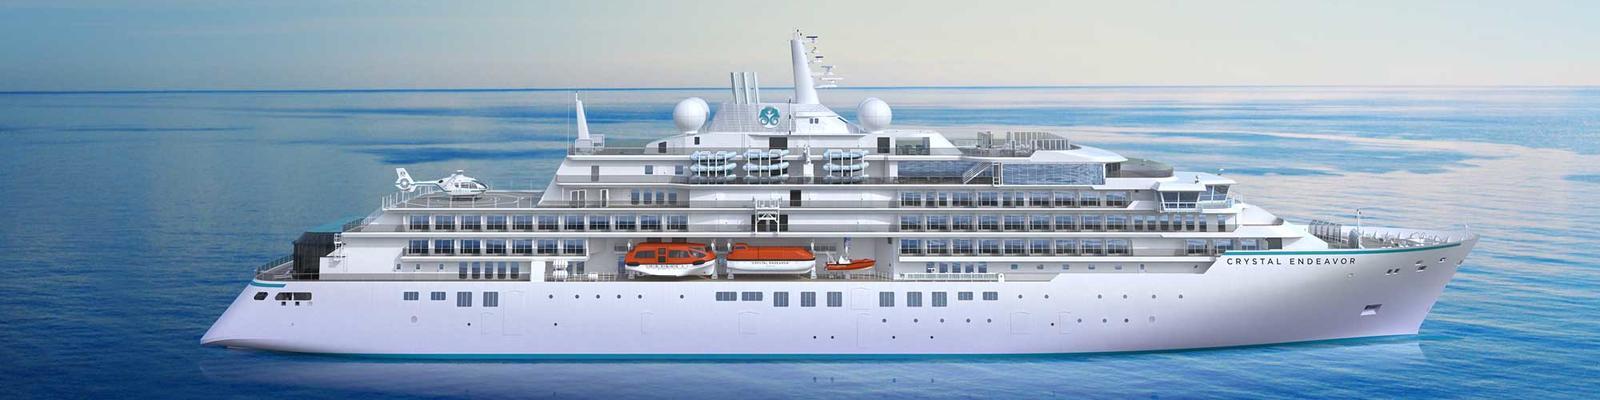 7 day Mediterranean Norwegian Jewel Cruise Pictures/music ...